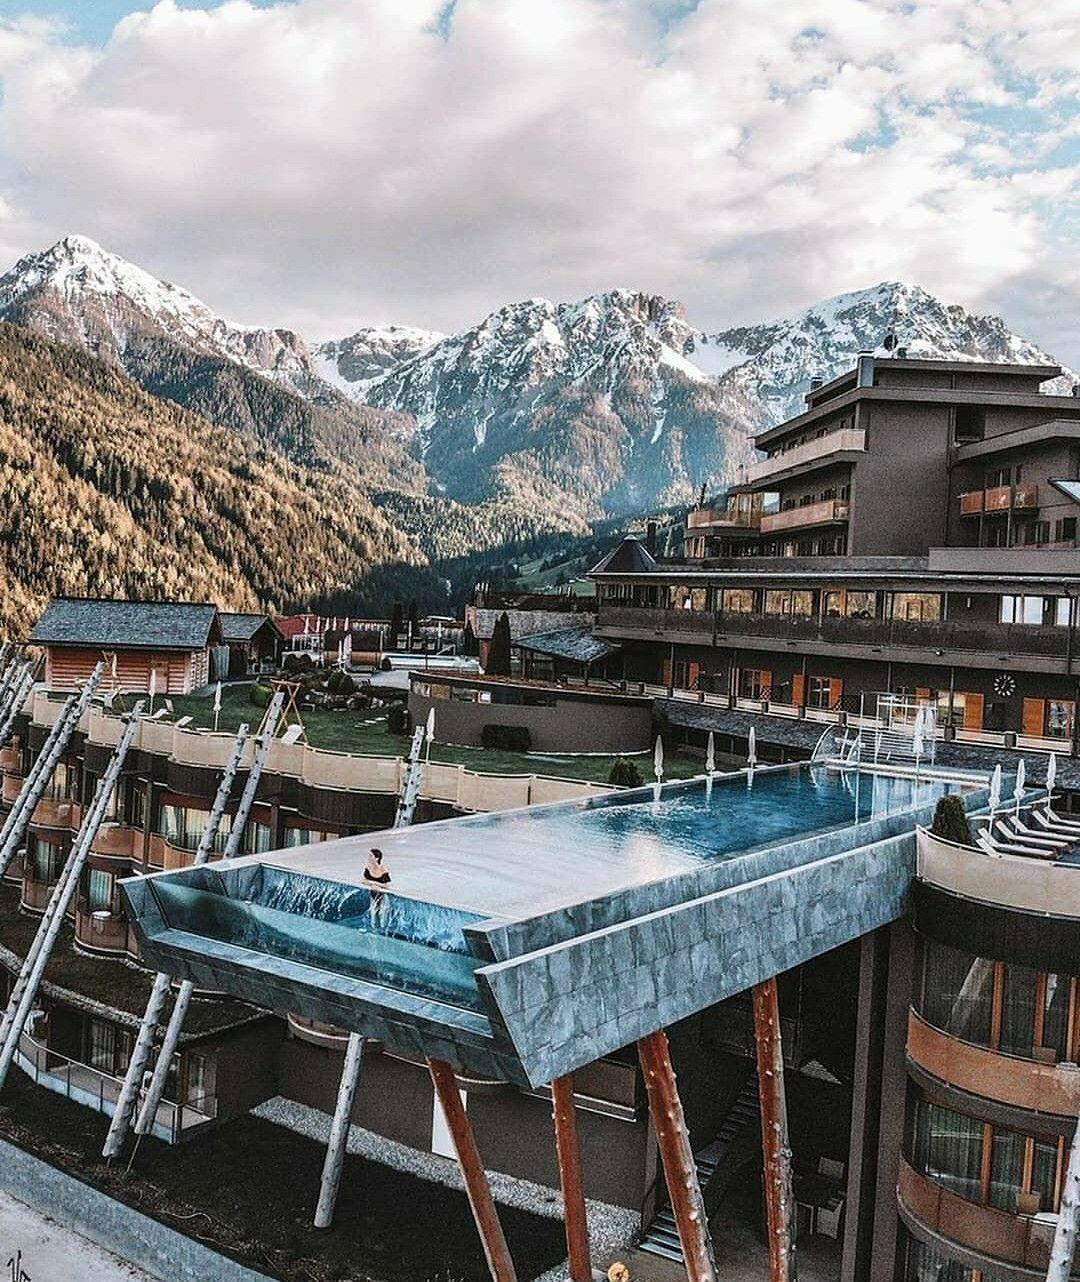 The Alpin Panorama Hotel Hubertus Designed By Lukas Rungger